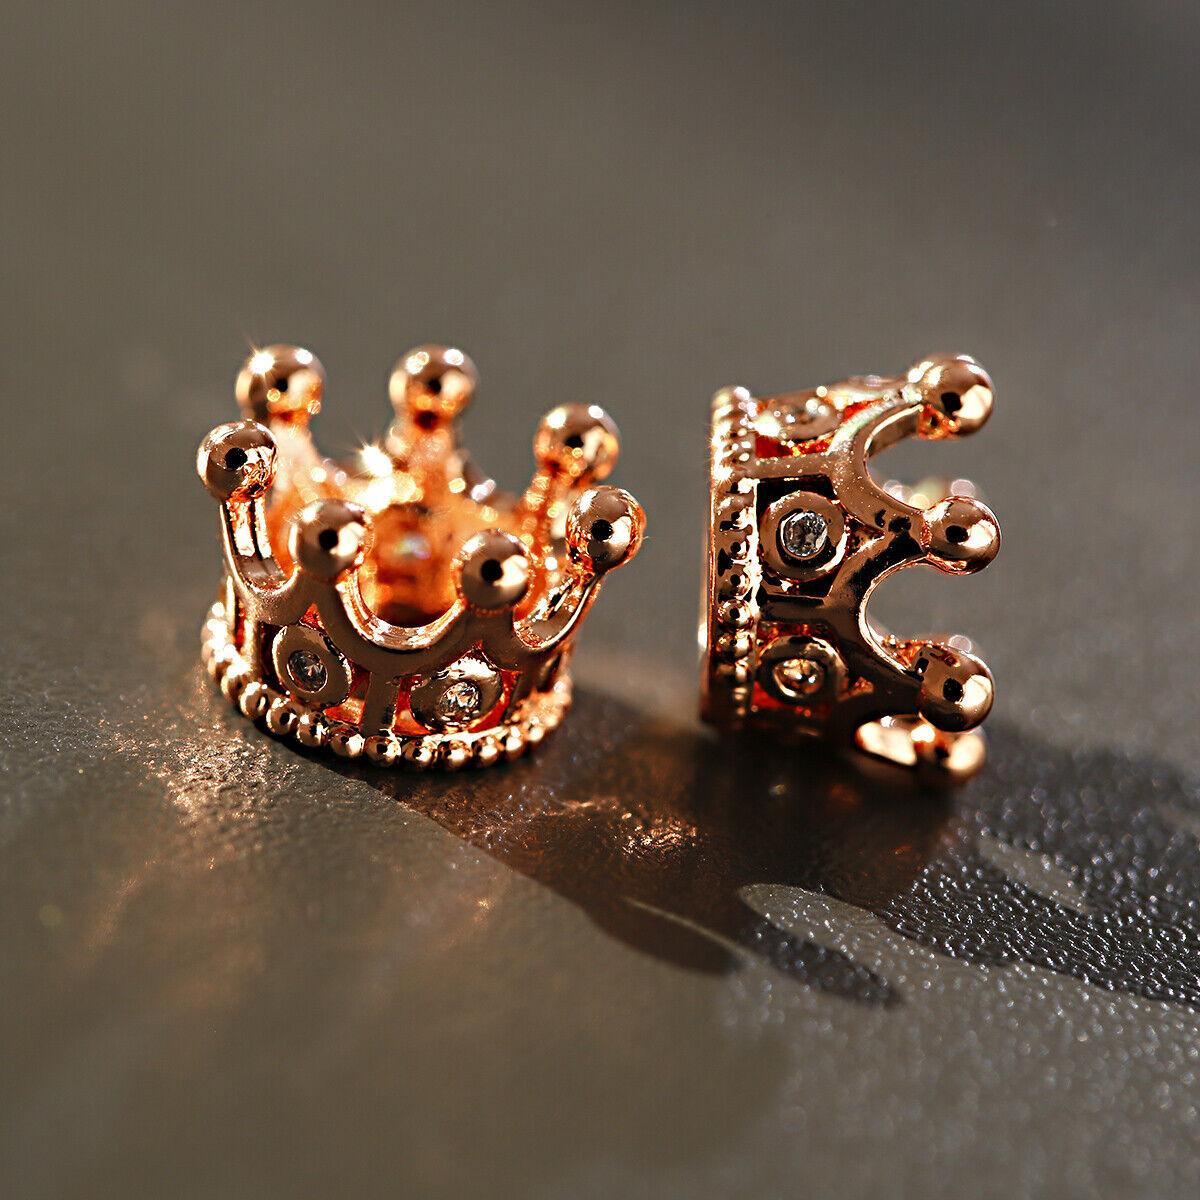 Zircon Gemstones Pave Queen Crown Bracelet Brass Copper Connector Charm Beads 10